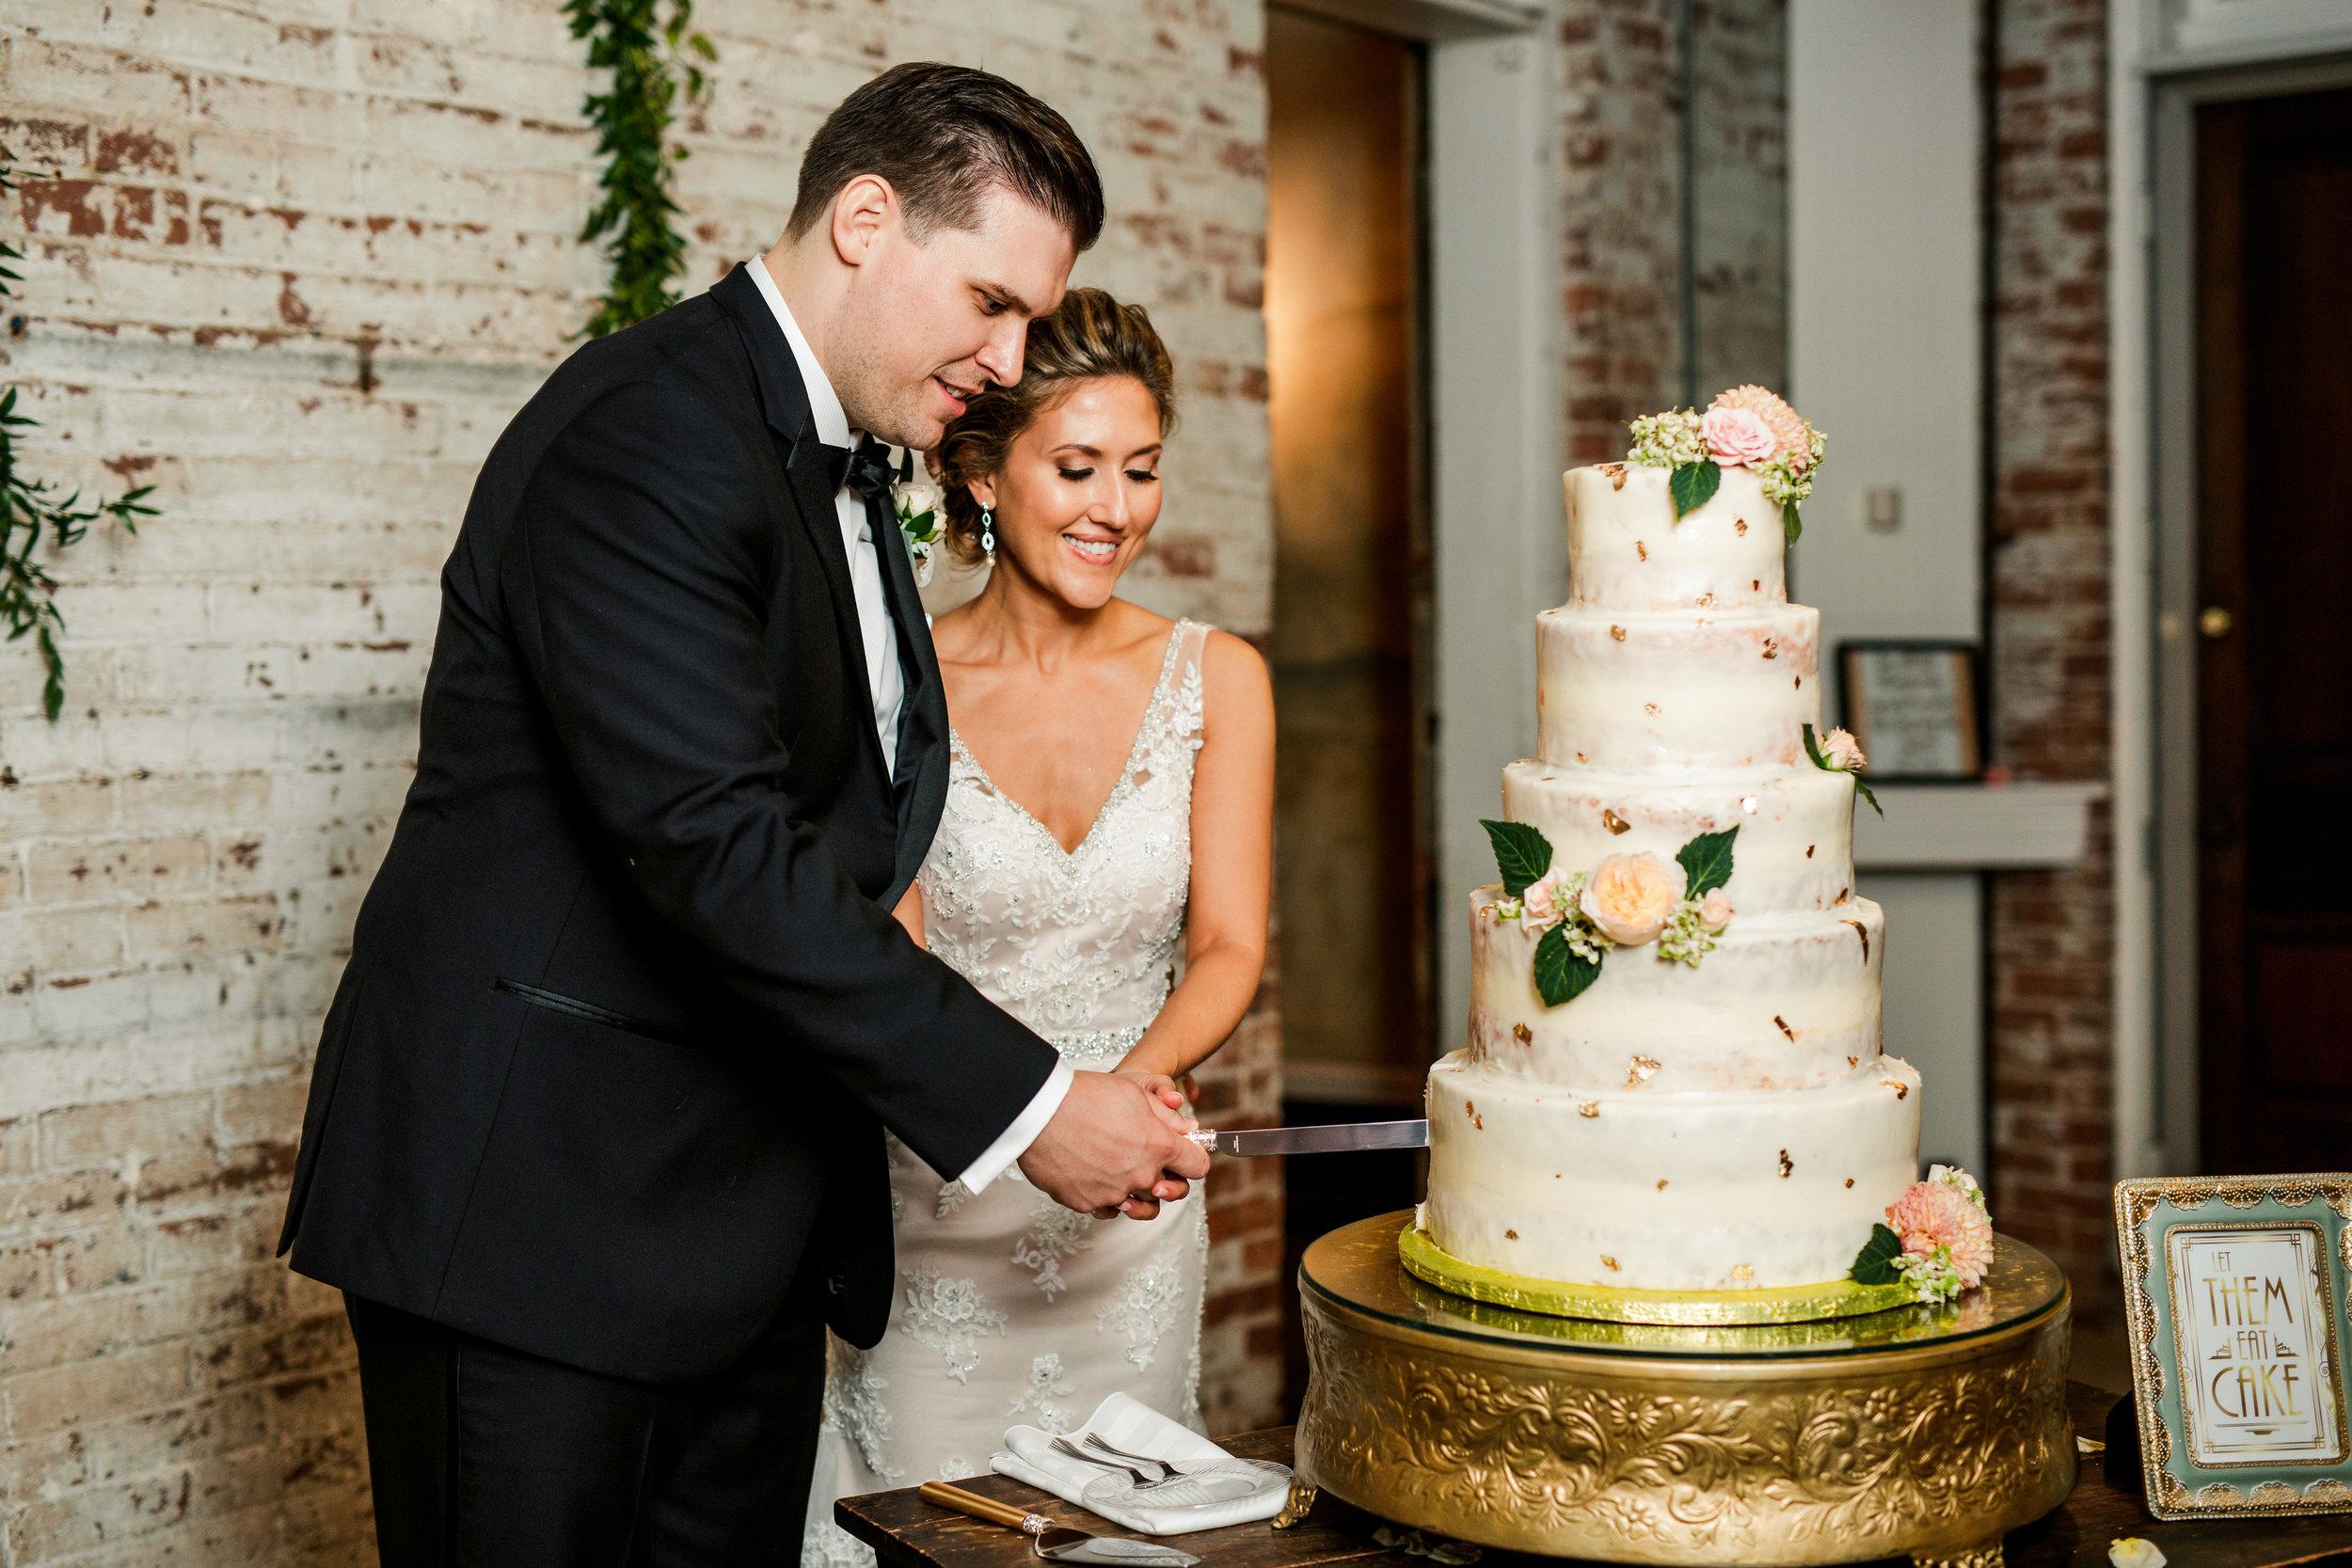 Riverwood-Mansion-Wedding38.jpg